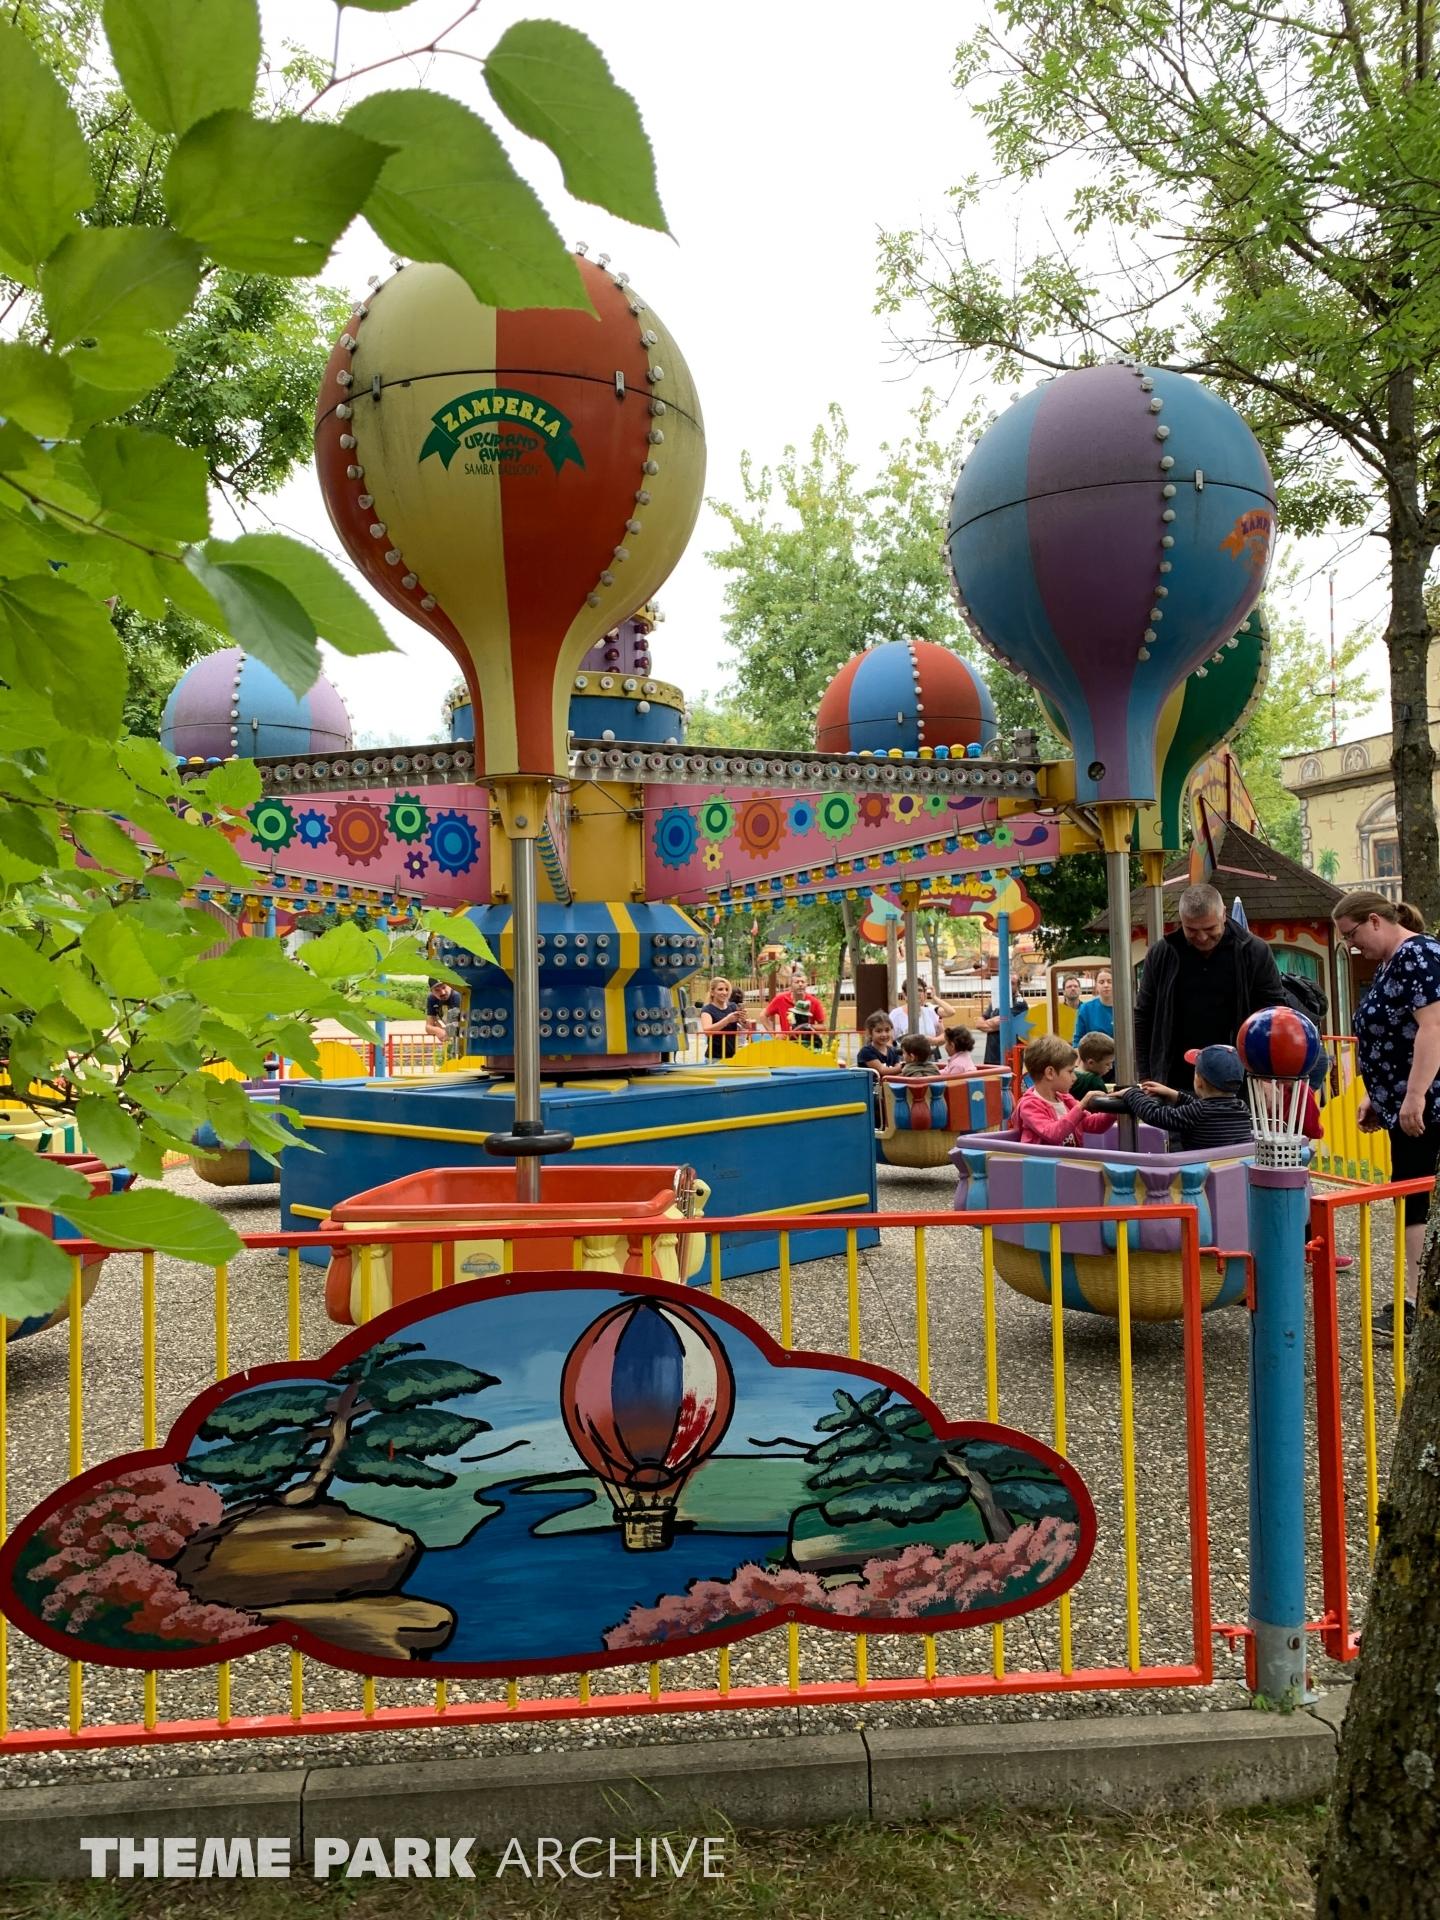 Juniors Ballonfahrt at Freizeit Land Geiselwind